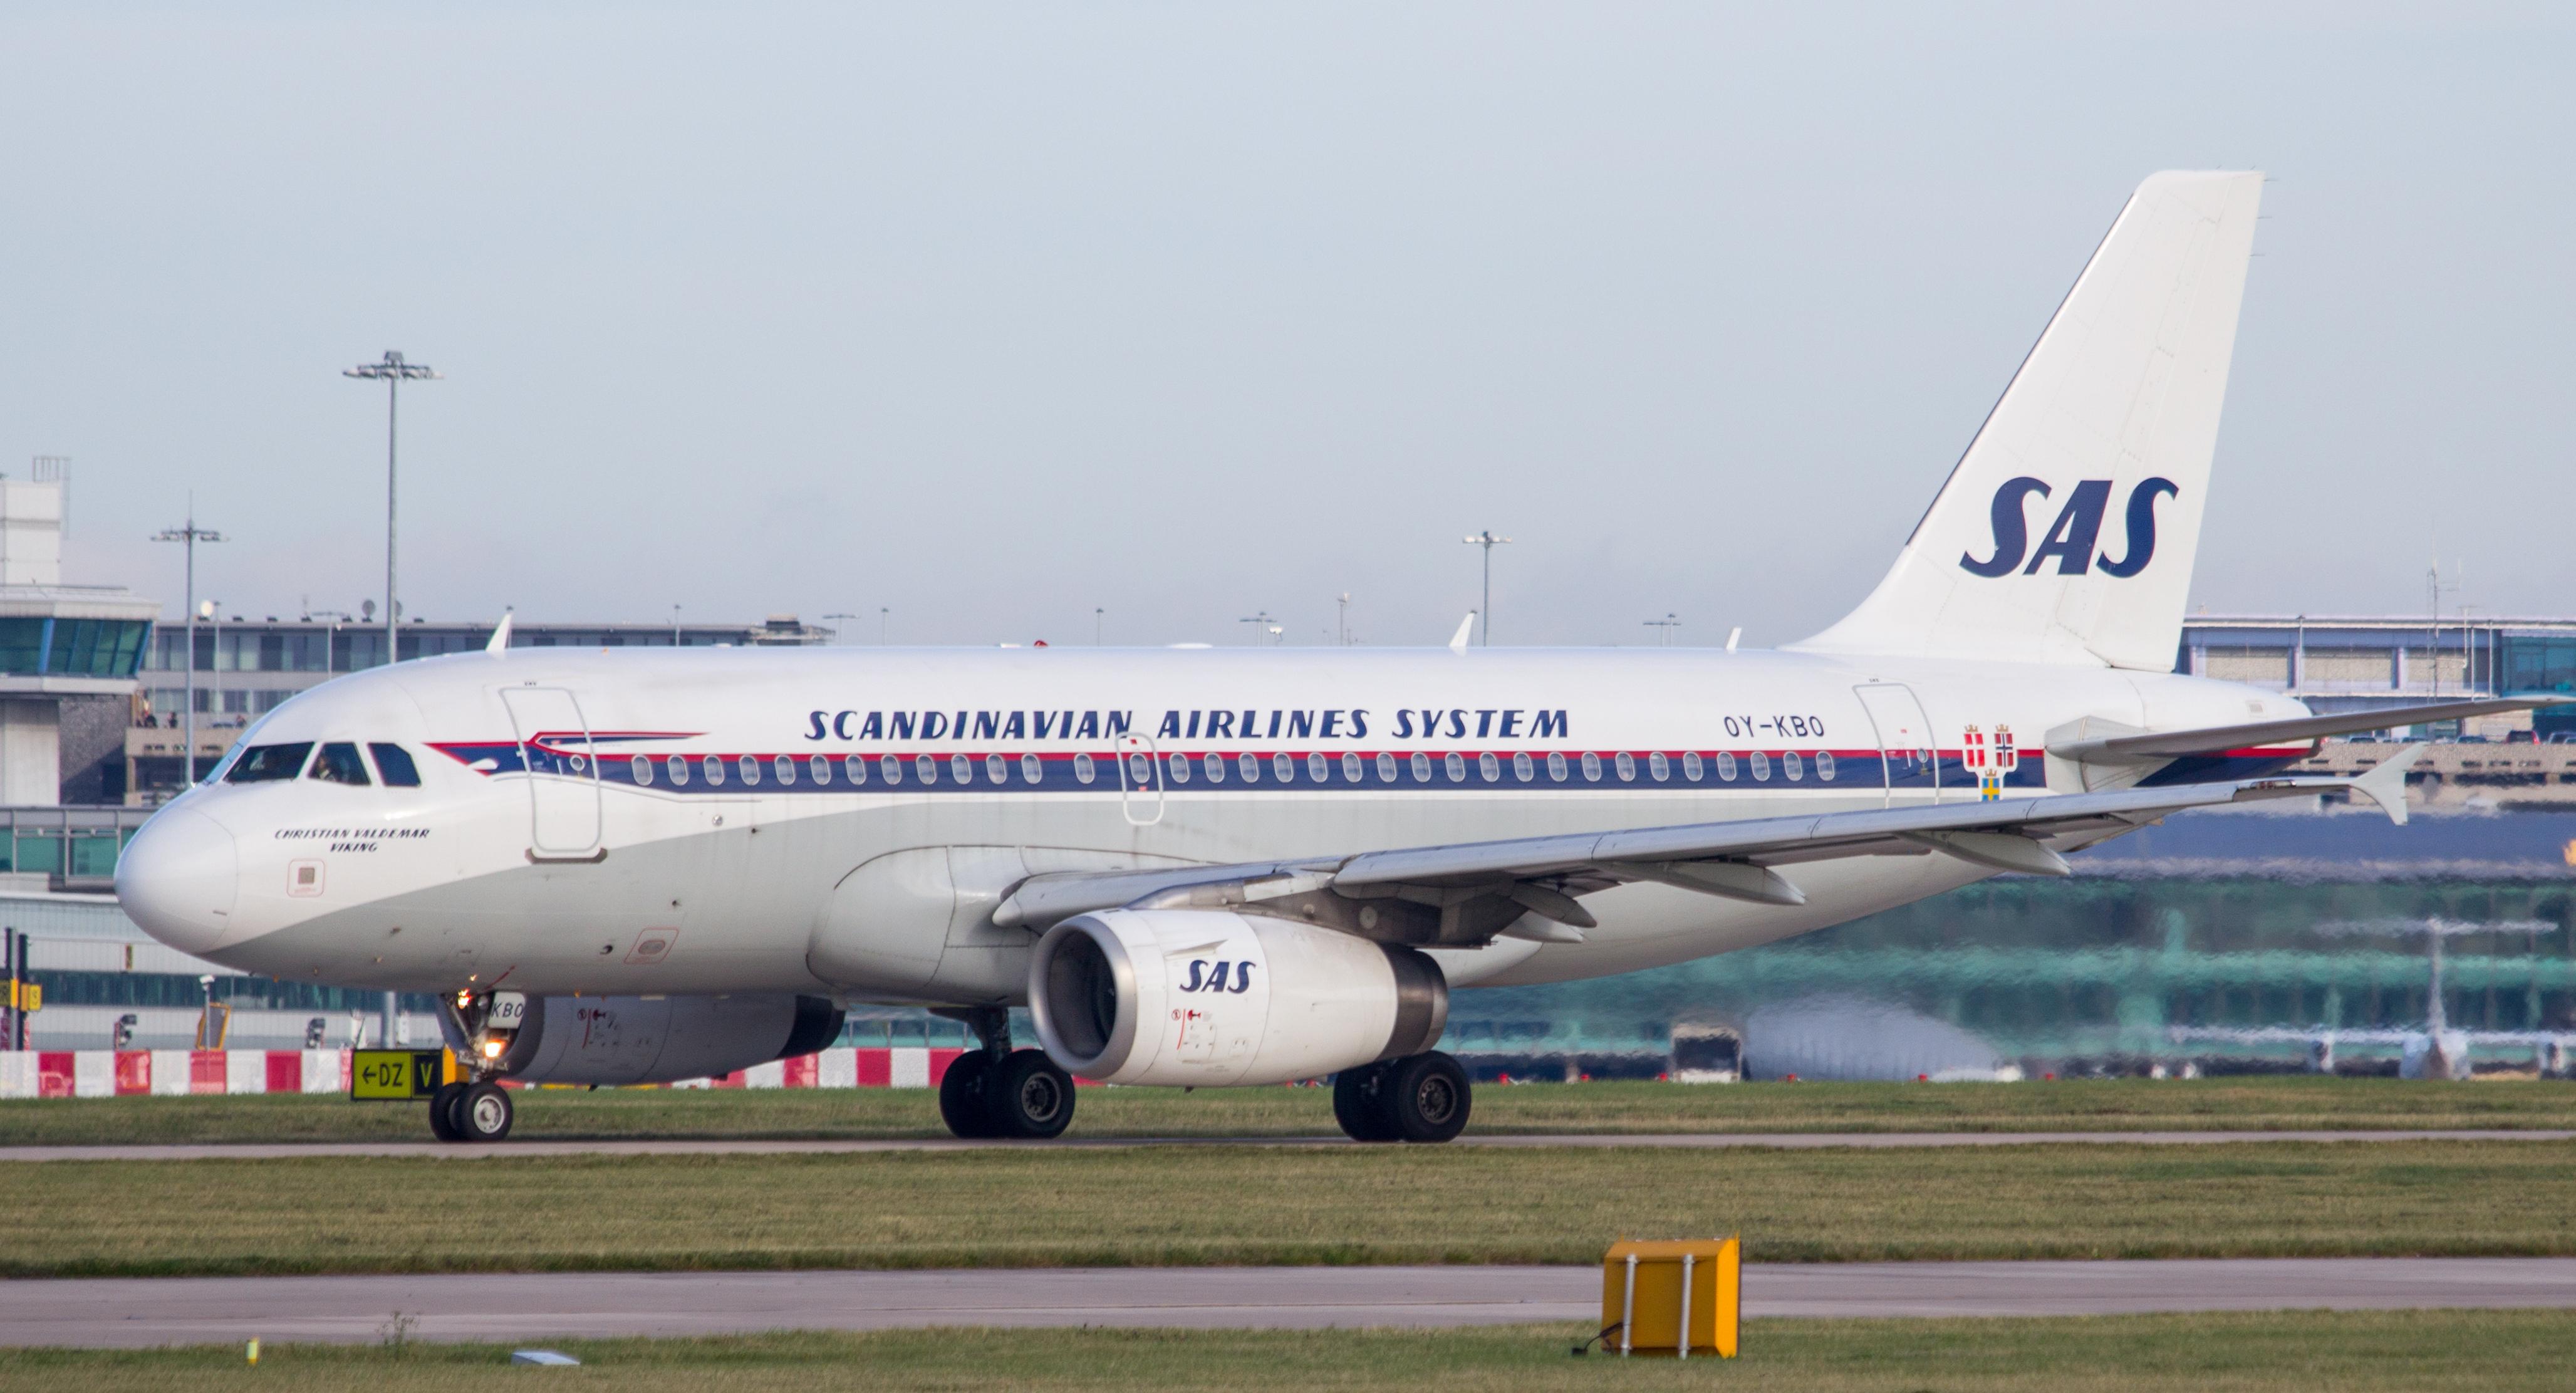 SAS A319-100 i retro-bemaling, registrering OY-KBO. (Foto: RHL Images   Creative Commons Attribution-Share Alike 2.0 Generic license)